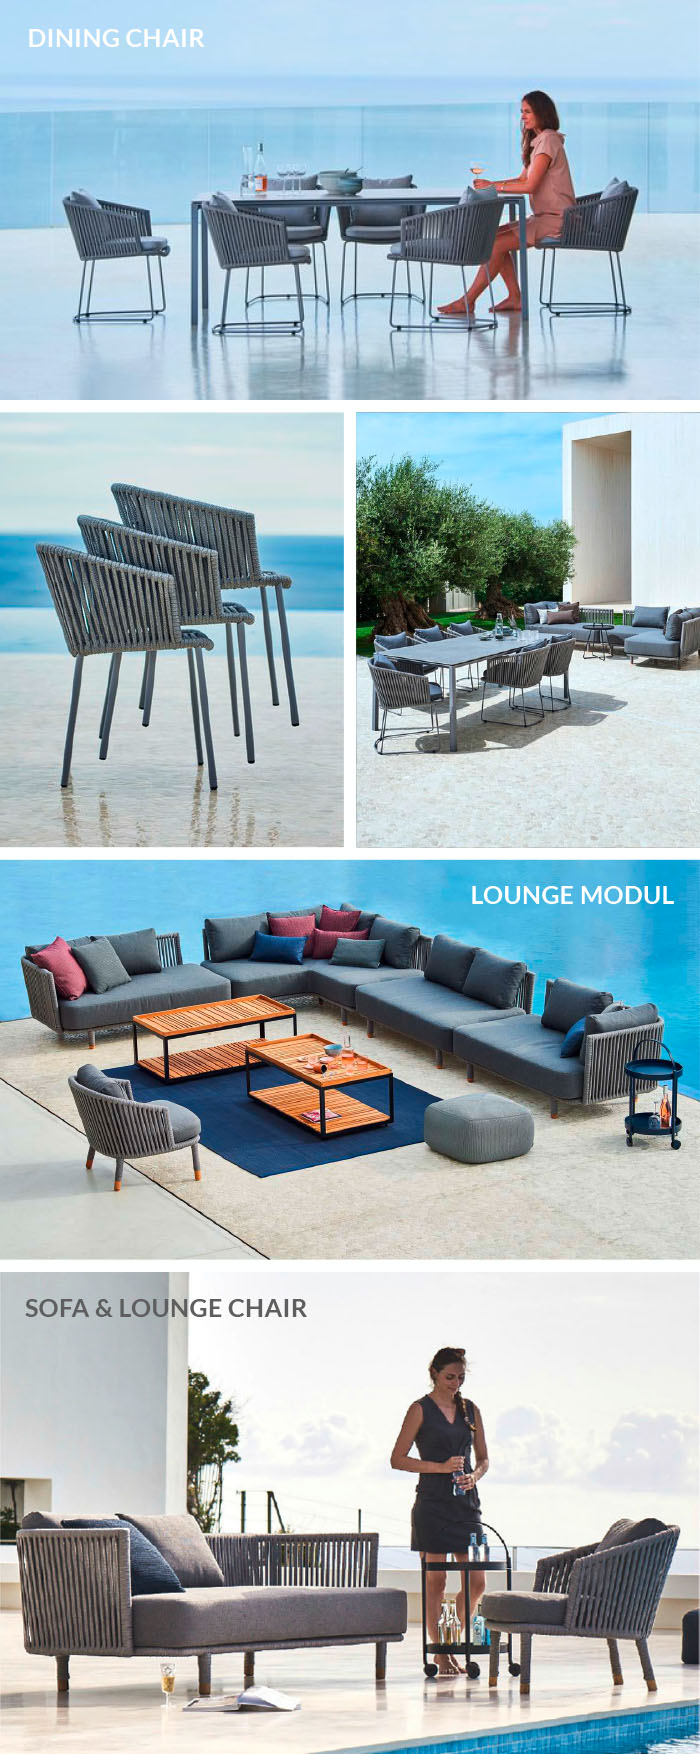 Lounge Gartenmöbel-Serie Moments von Cane-line: Sofa, Modul-Elemente, Dining Chairs, Lounge Sessel